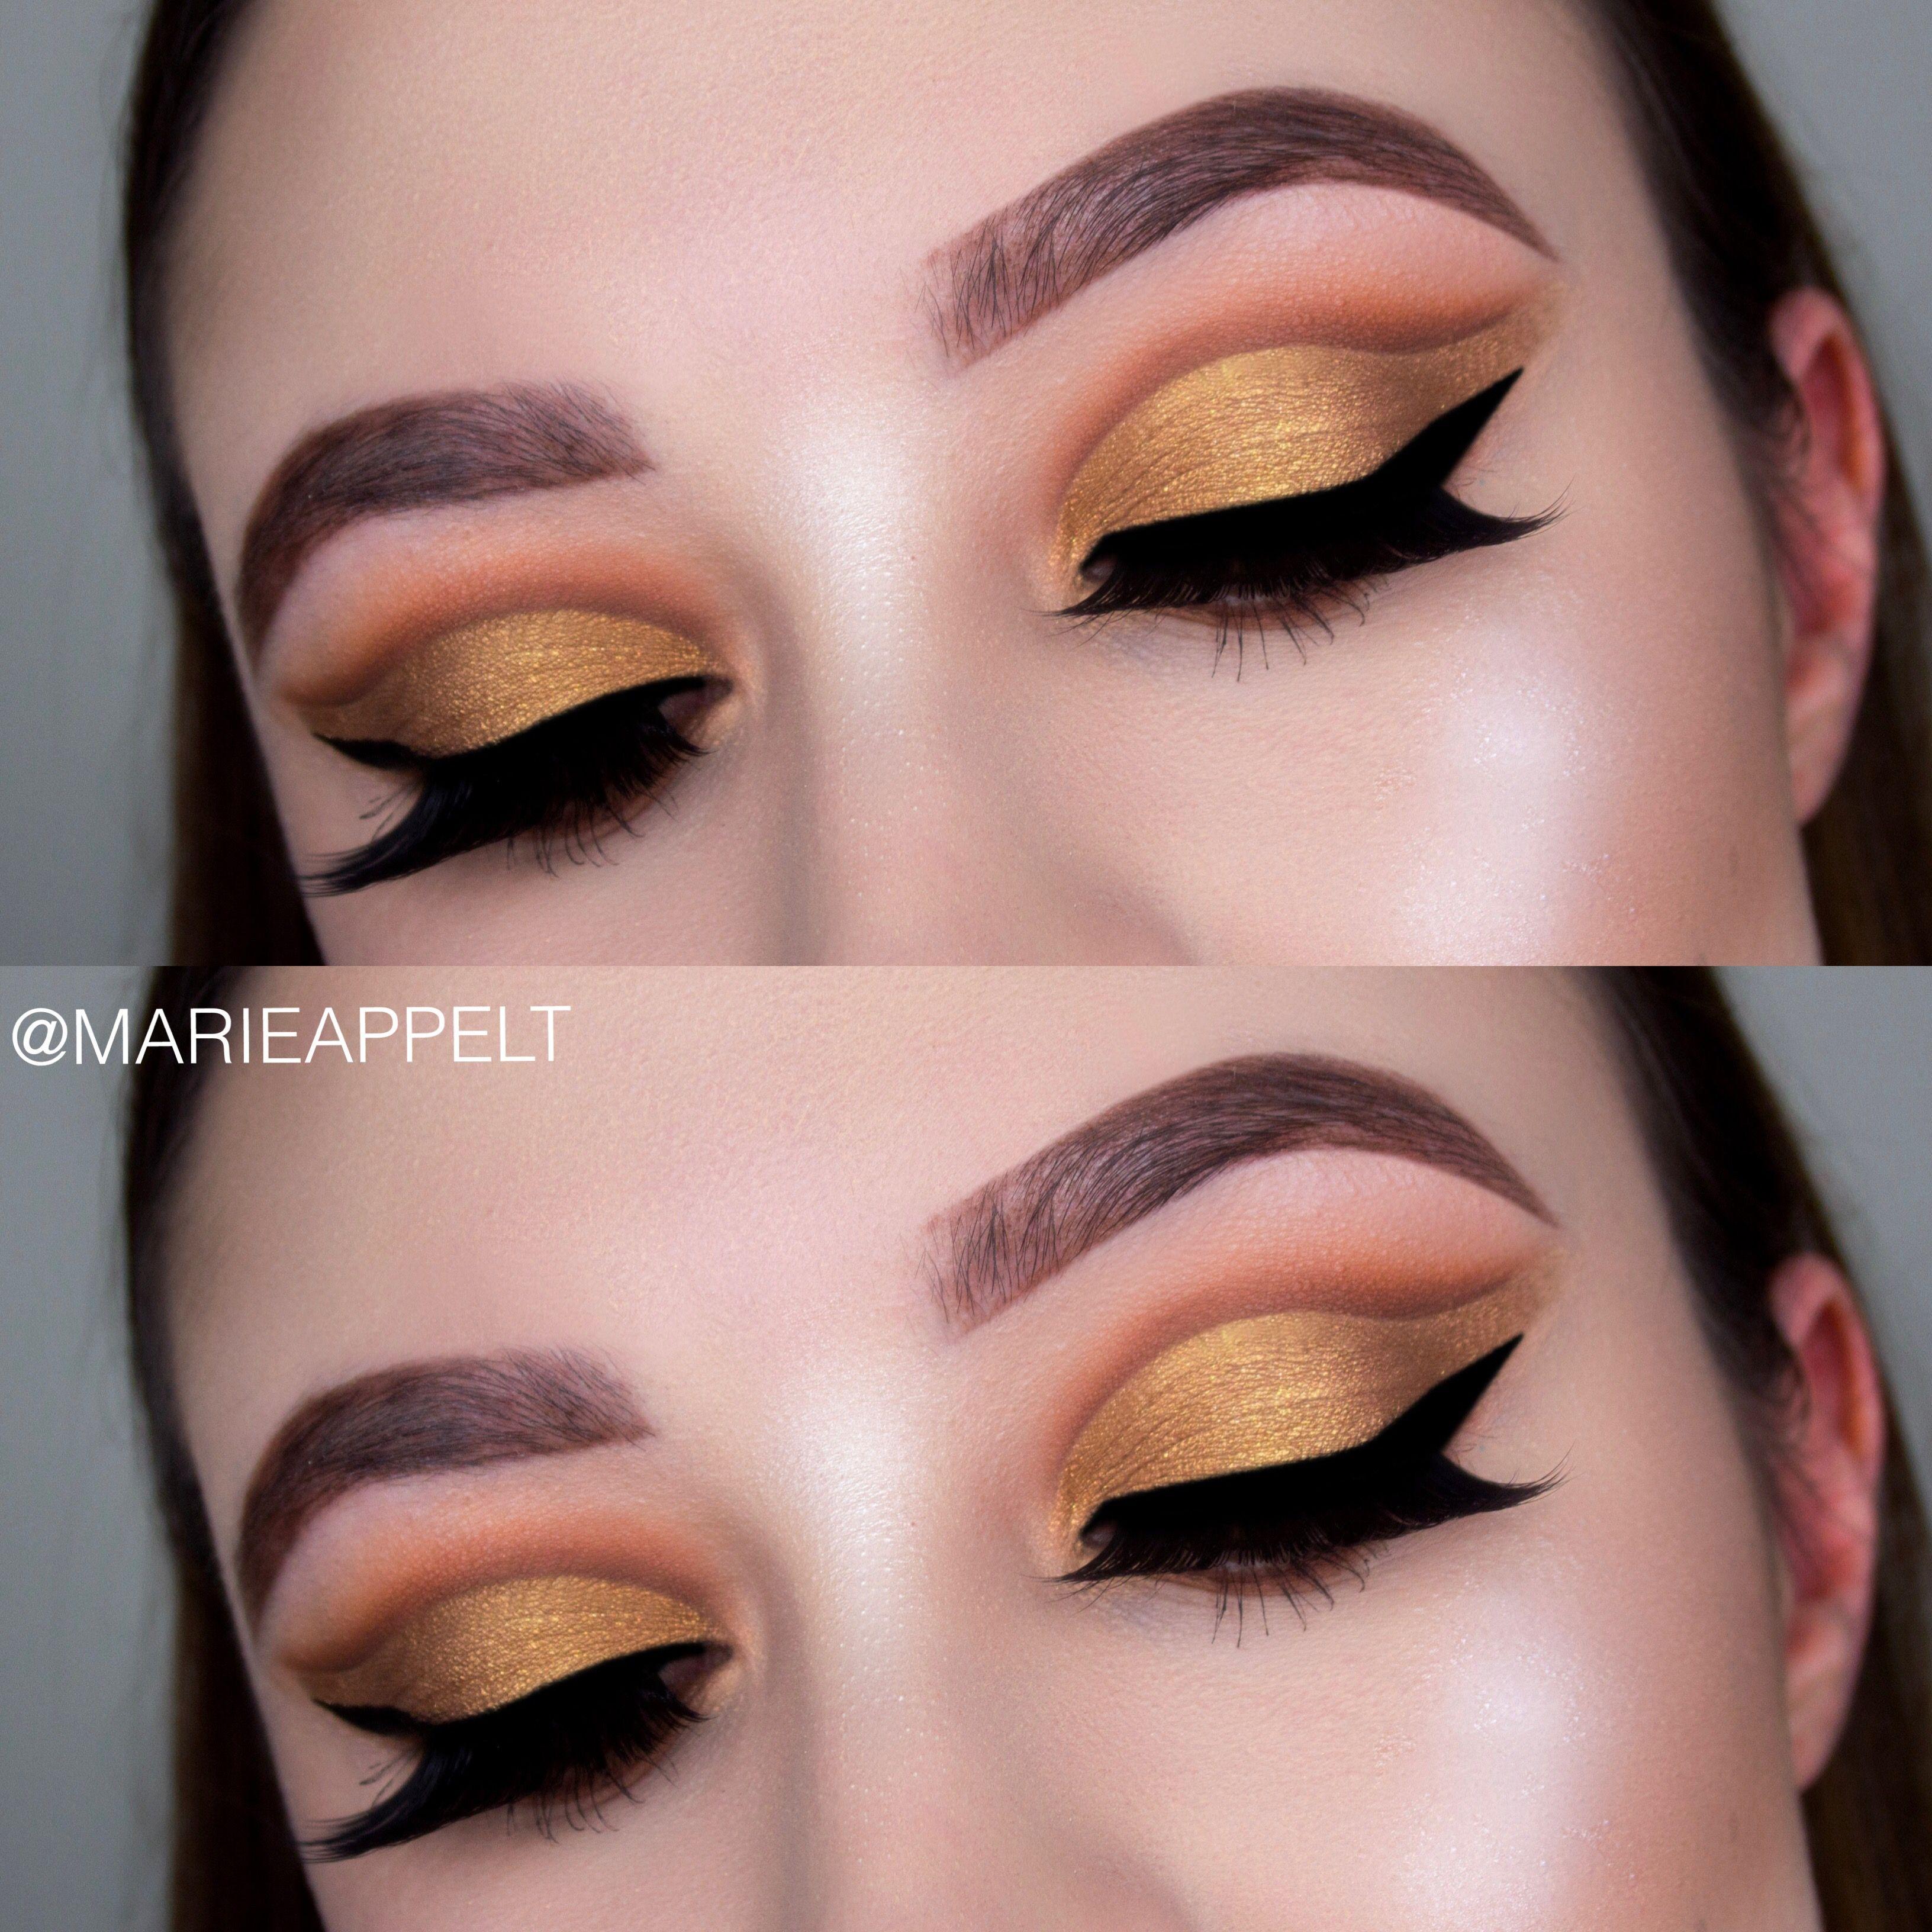 ABH Soft Glam Eyeshadow Palette Unibeautica